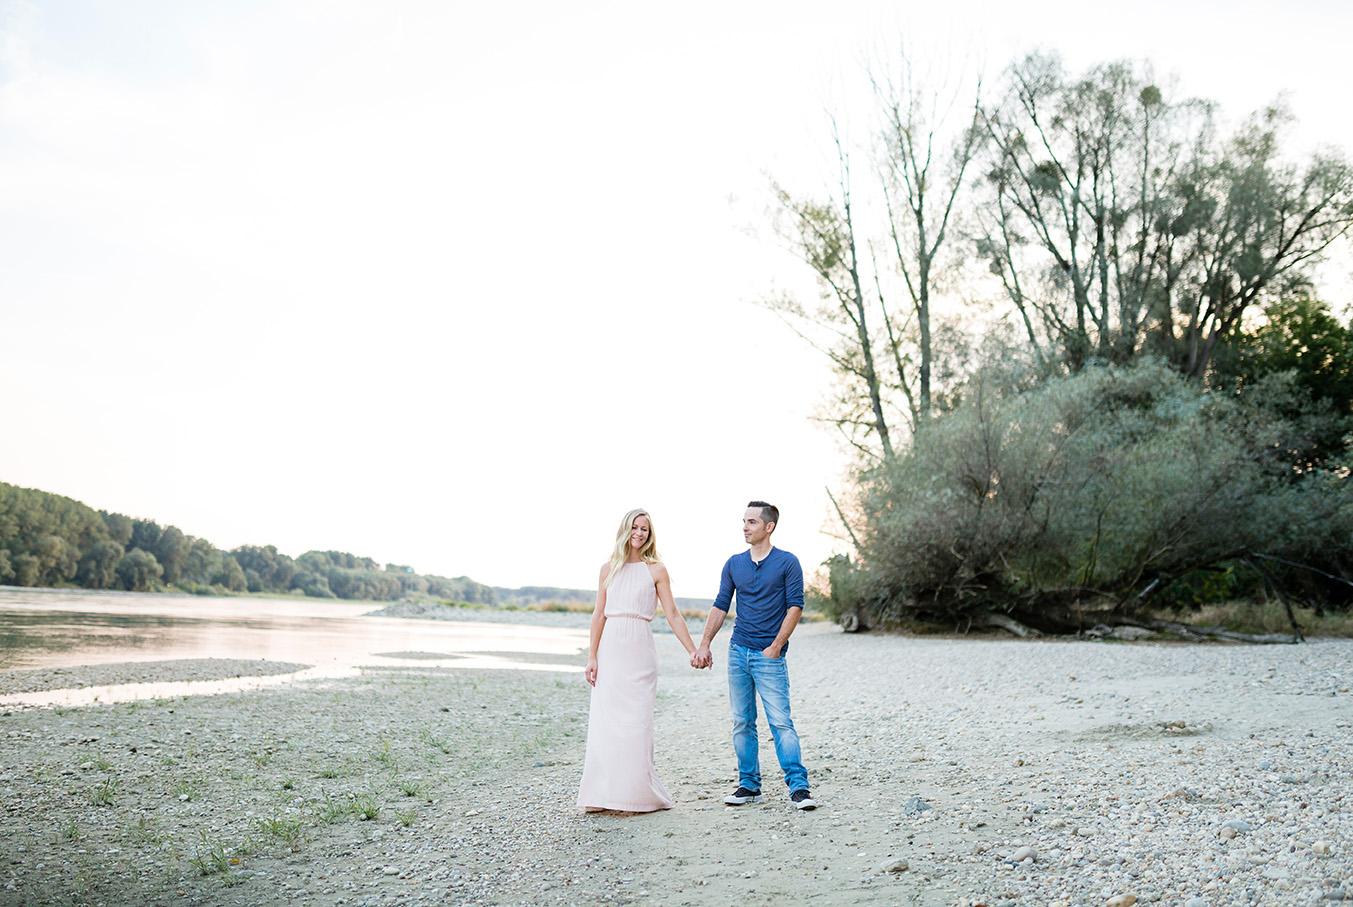 Vienna_Wien_Couple_Hochzeit_Paar_Verlobung_Engagement_Shooting_25